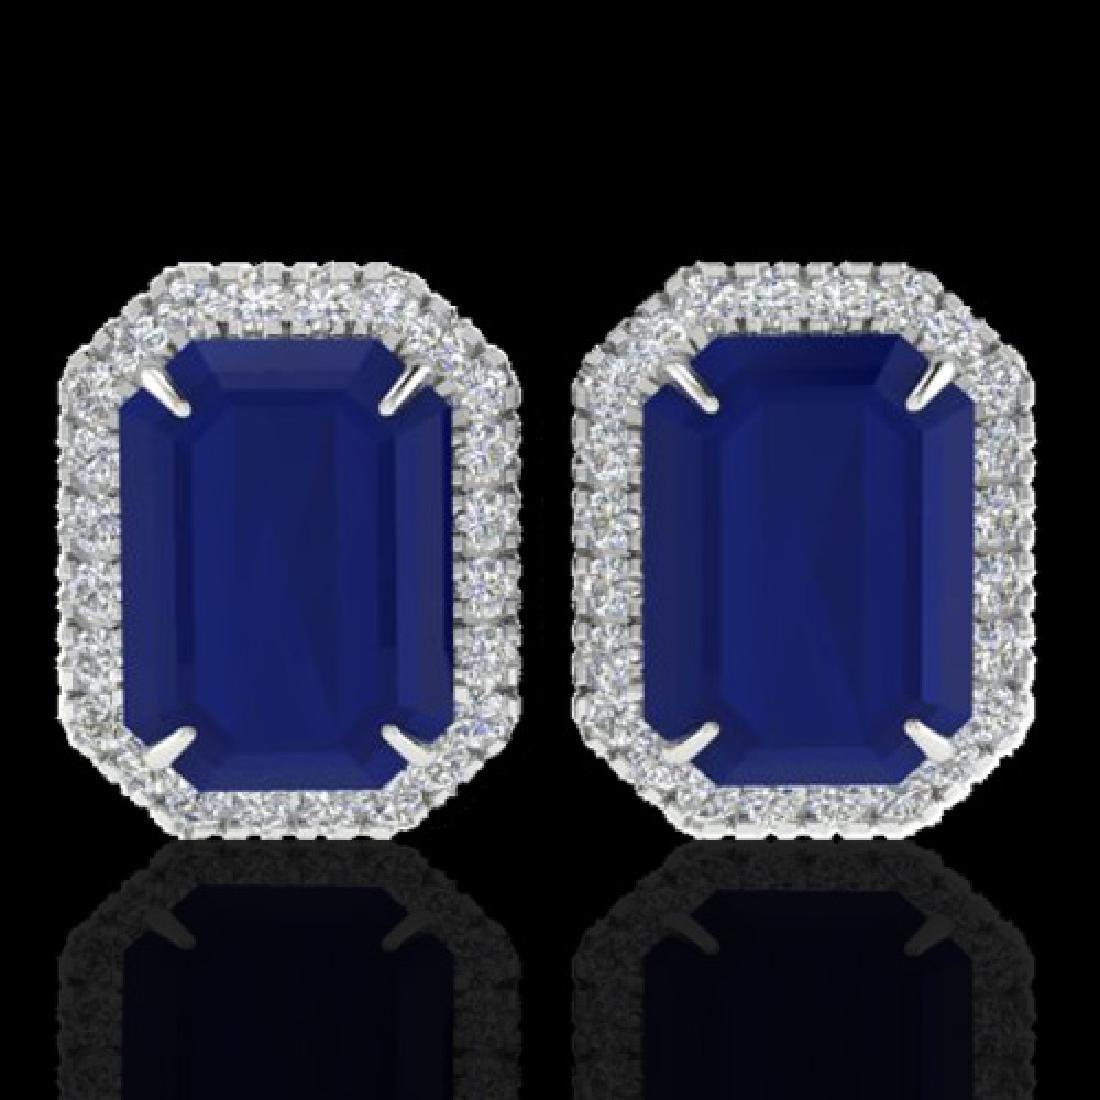 14 CTW Sapphire And Micro Pave VS/SI Diamond Halo